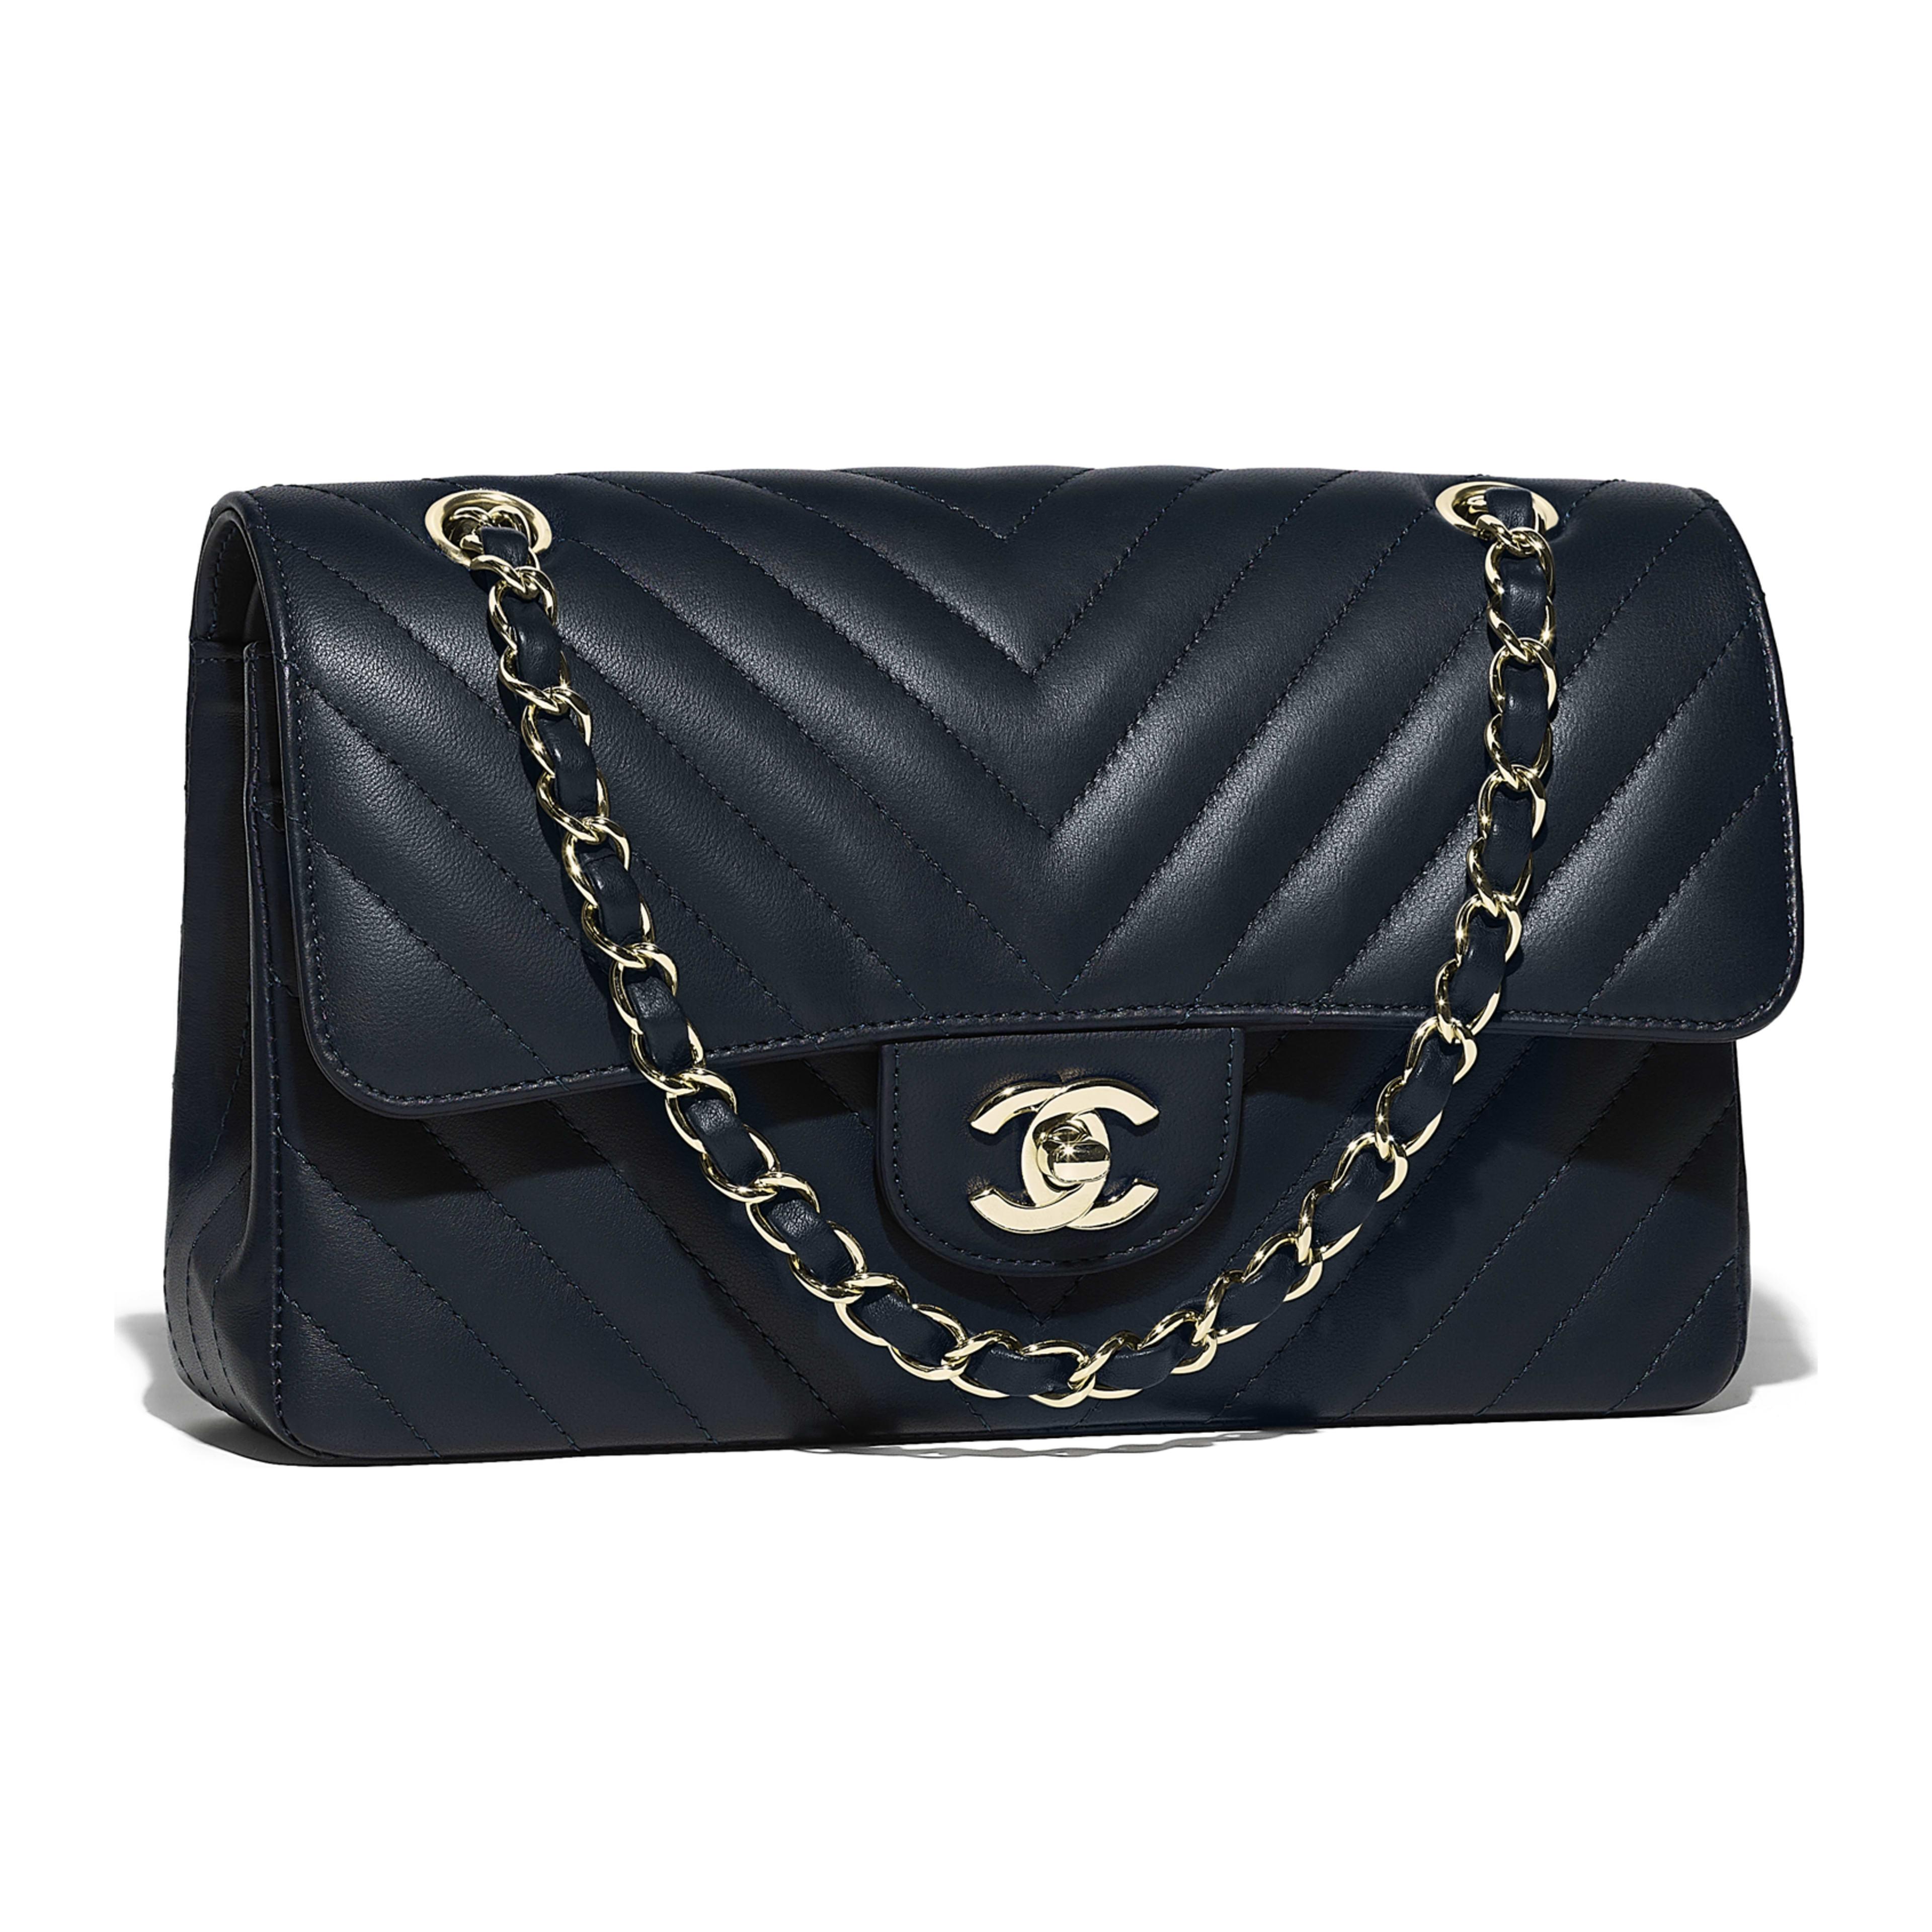 Small Classic Handbag